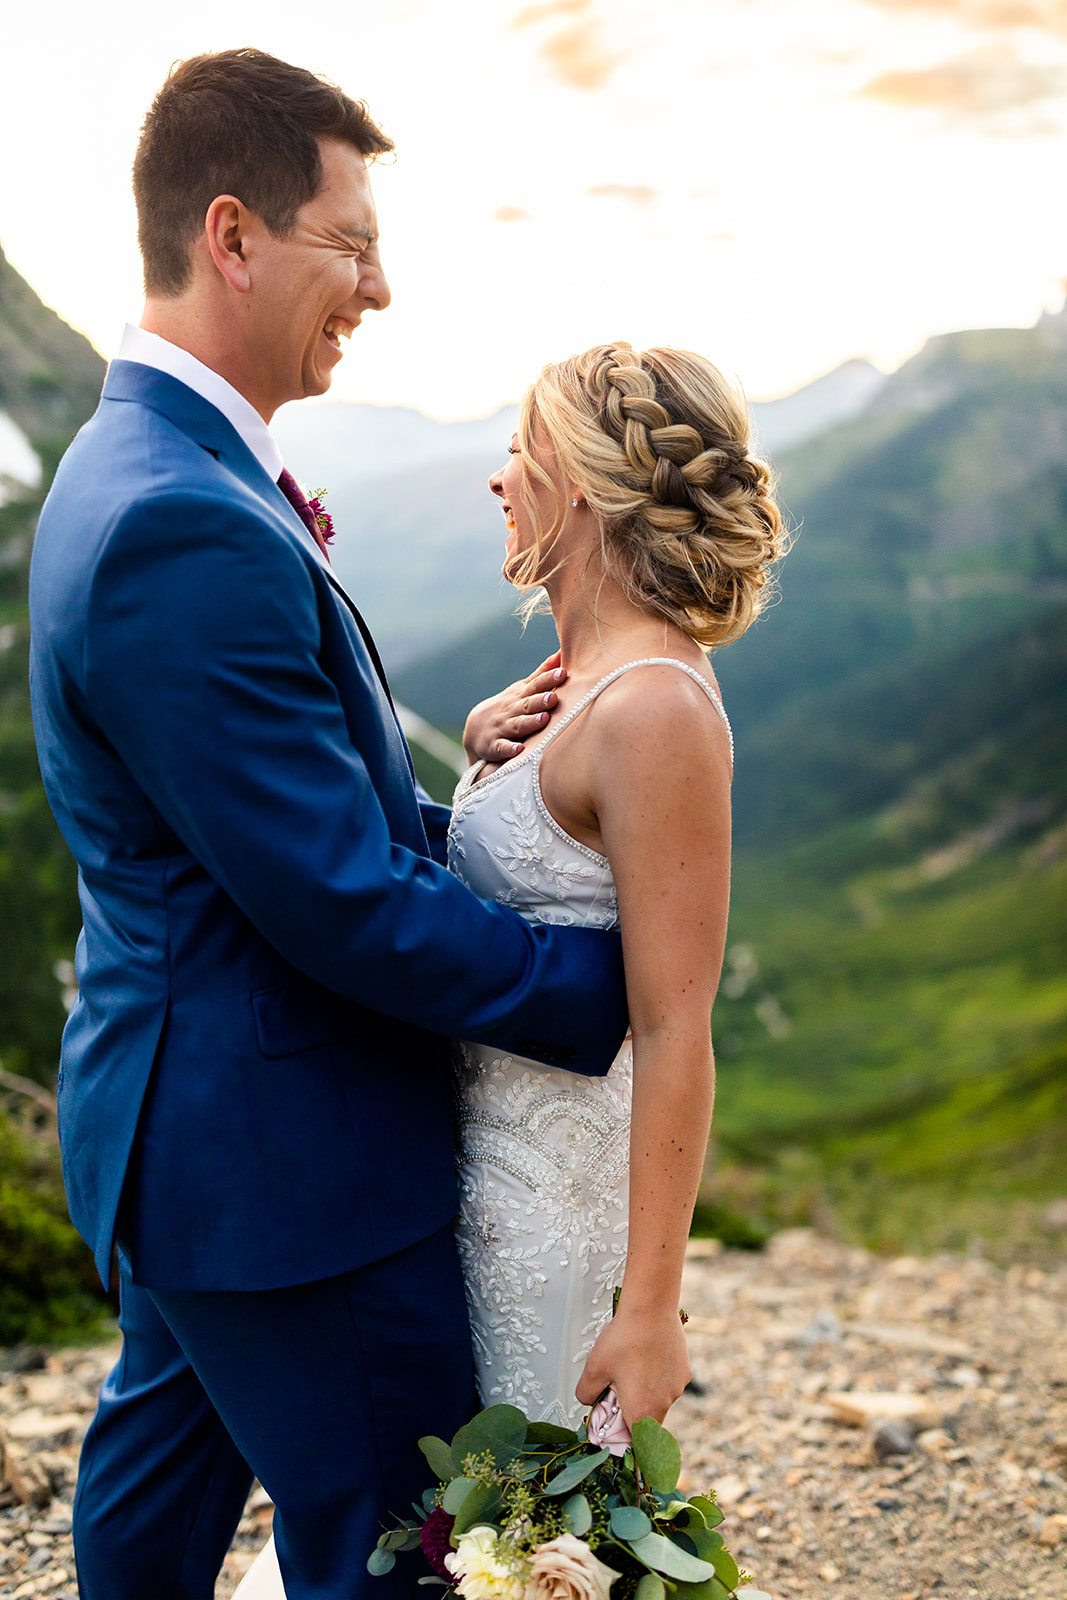 Highline Trail Wedding Photo